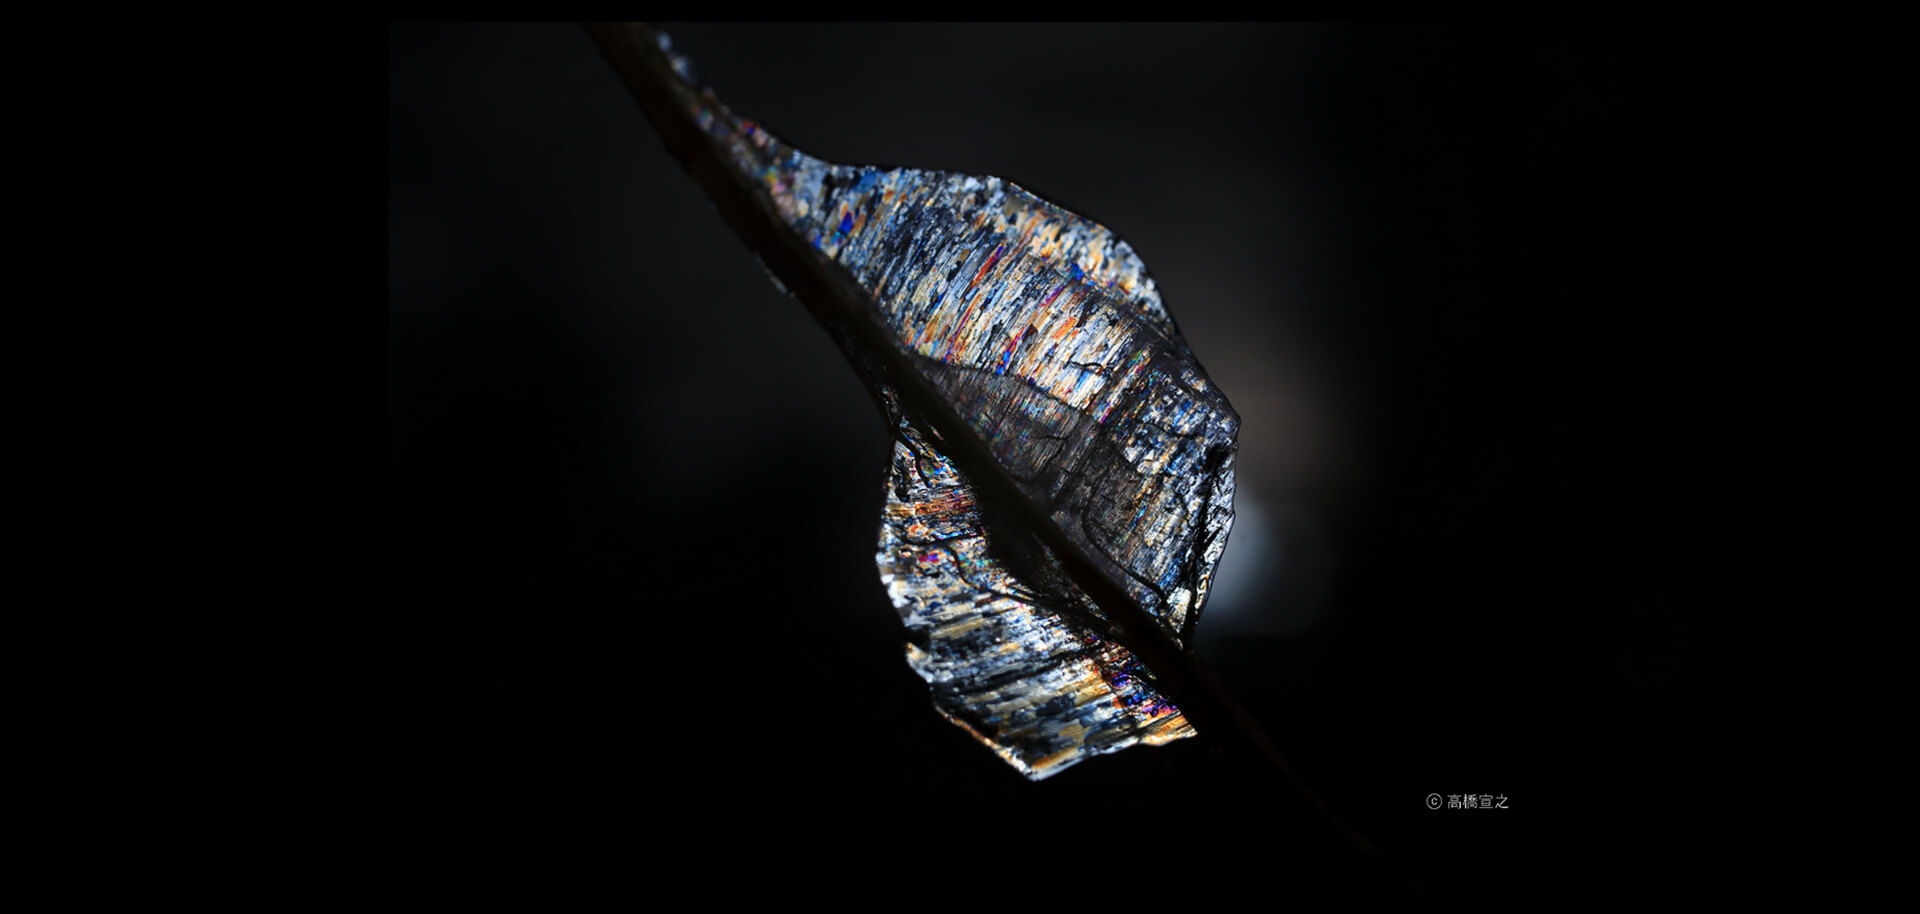 高橋宣之写真展「神々の水系」